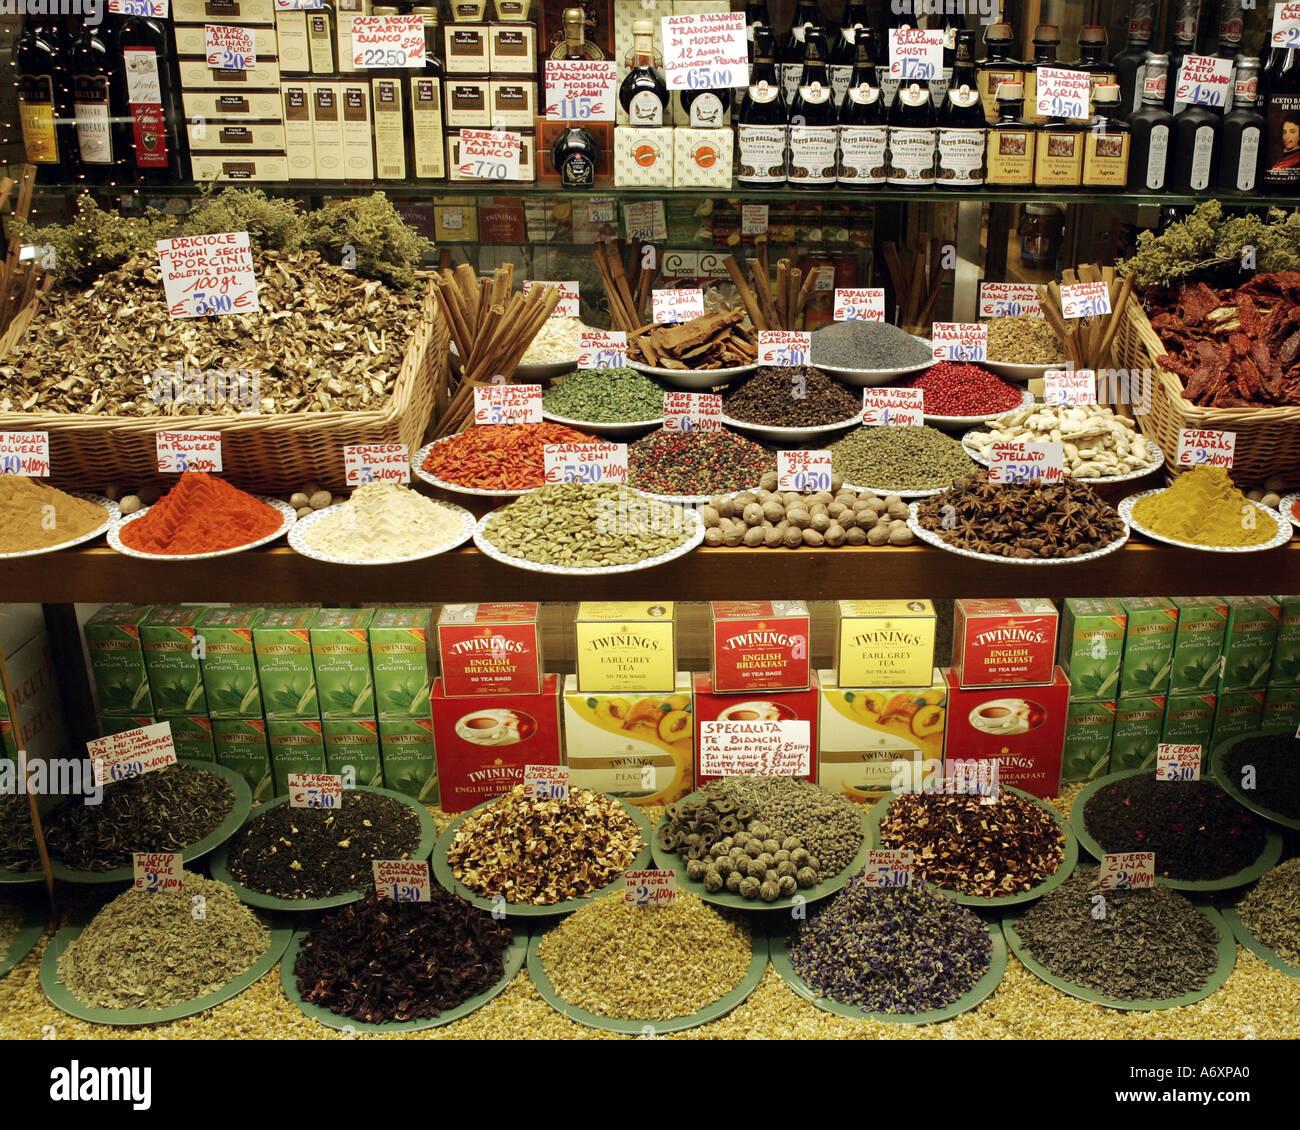 Italian Venetian Delicatessen Shop Window Display - Stock Image